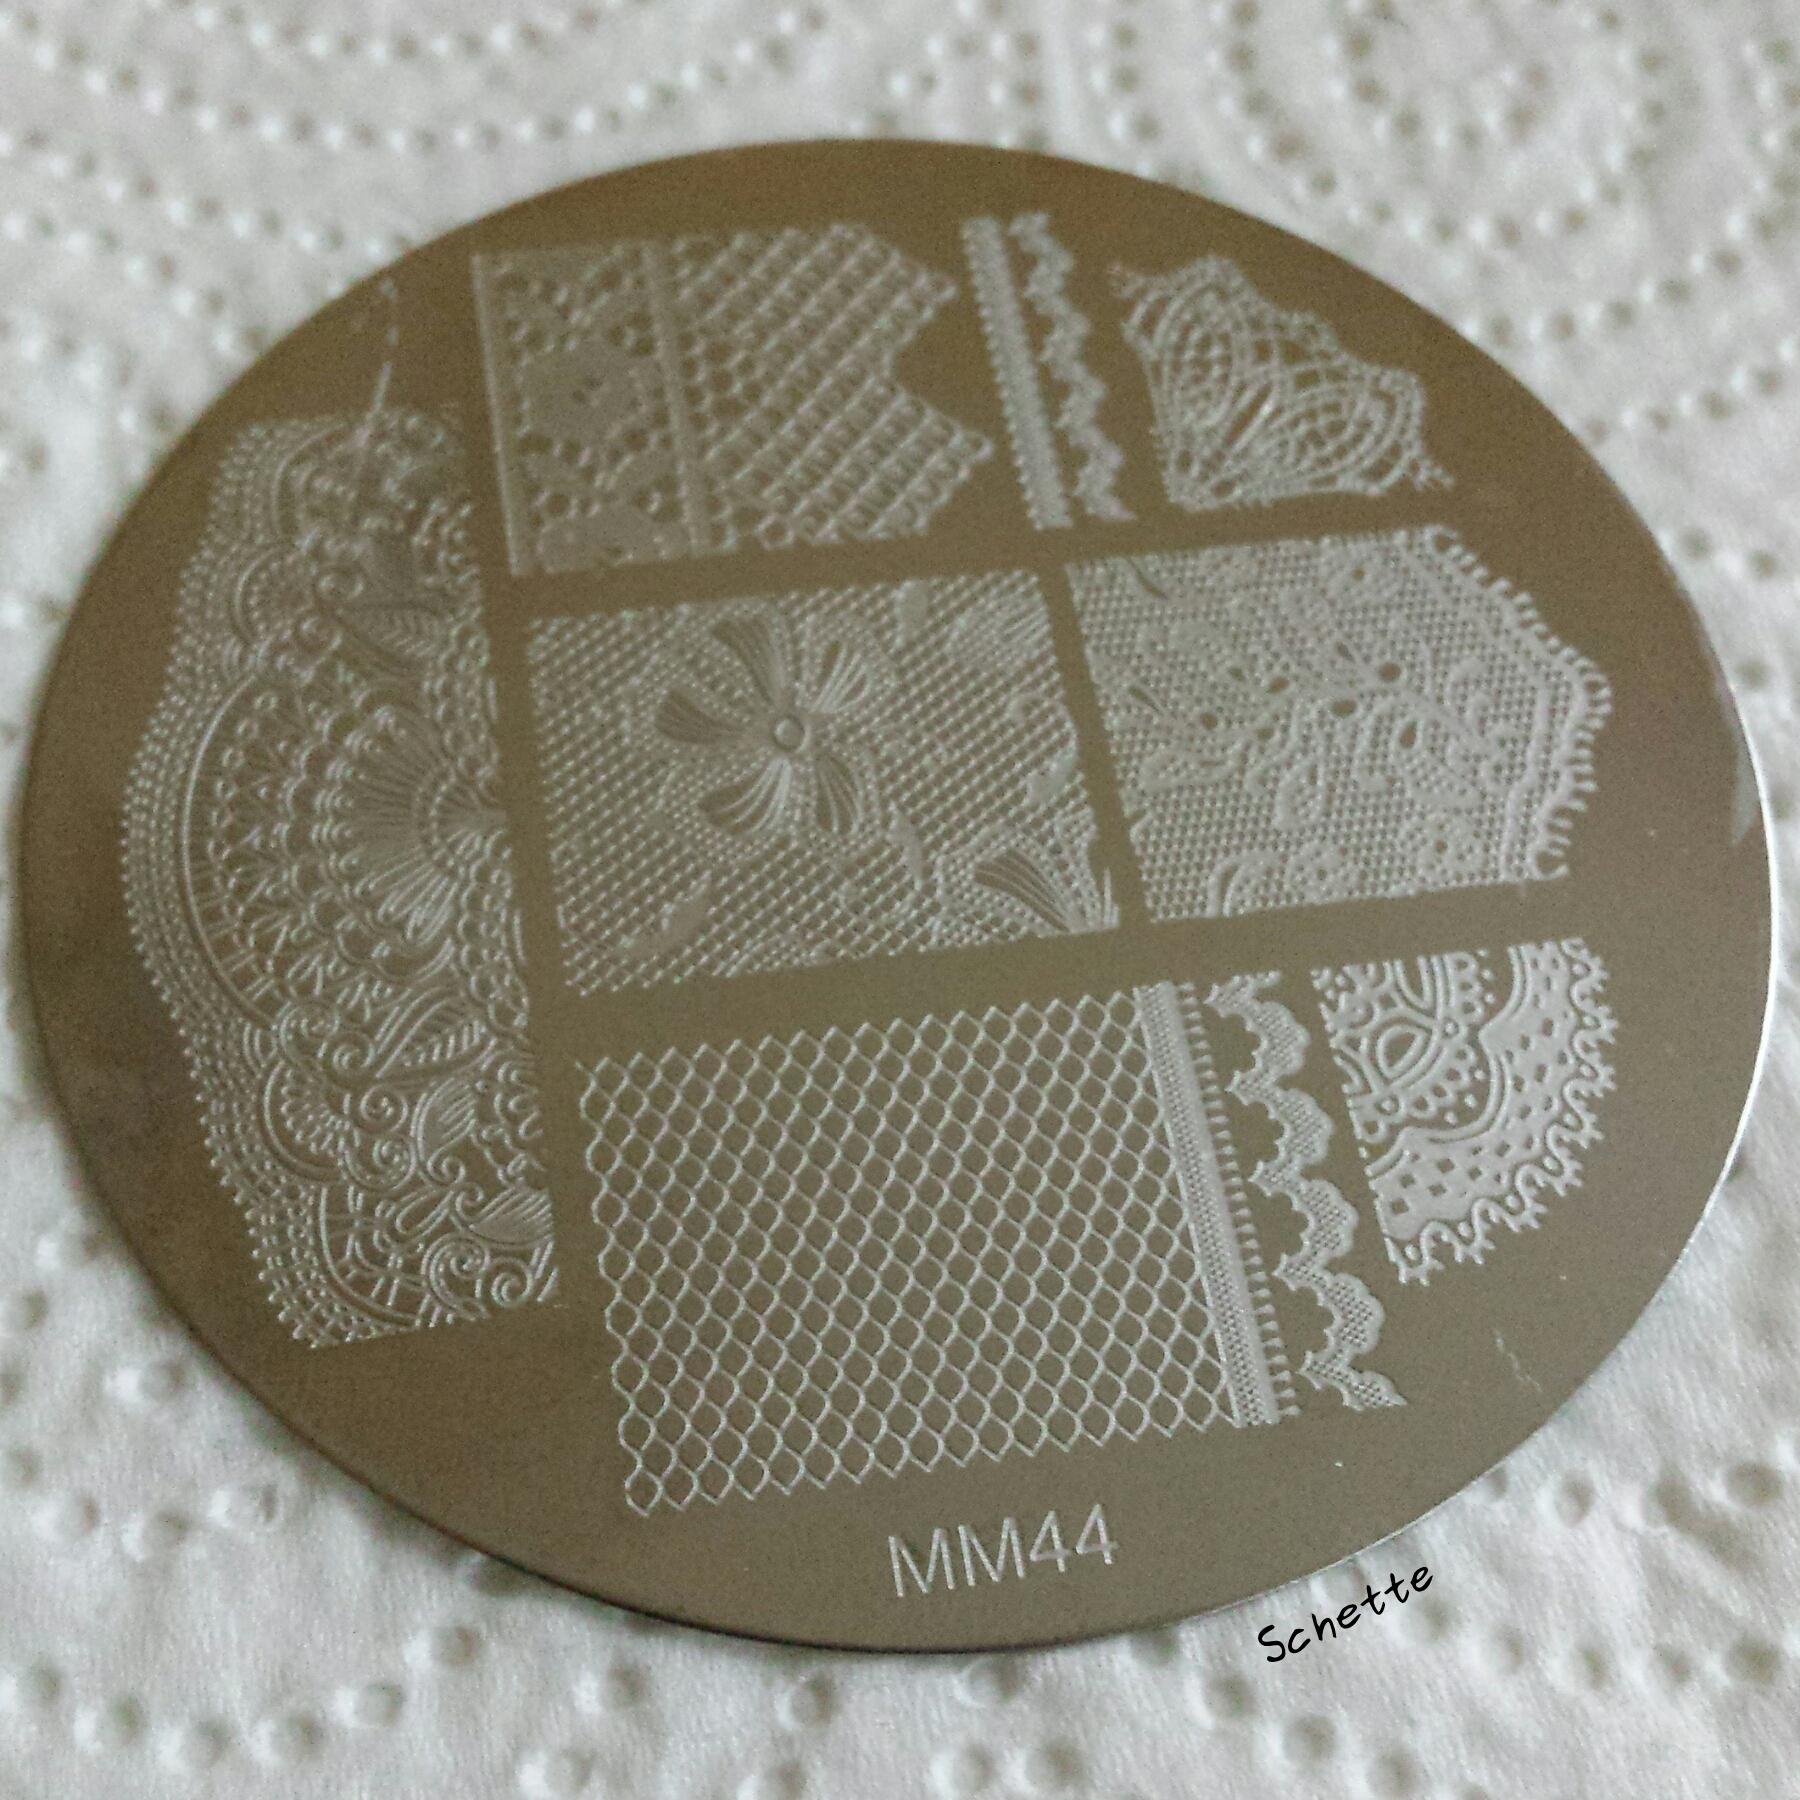 Messy Mansion : Medium Stamper and MM44 plate